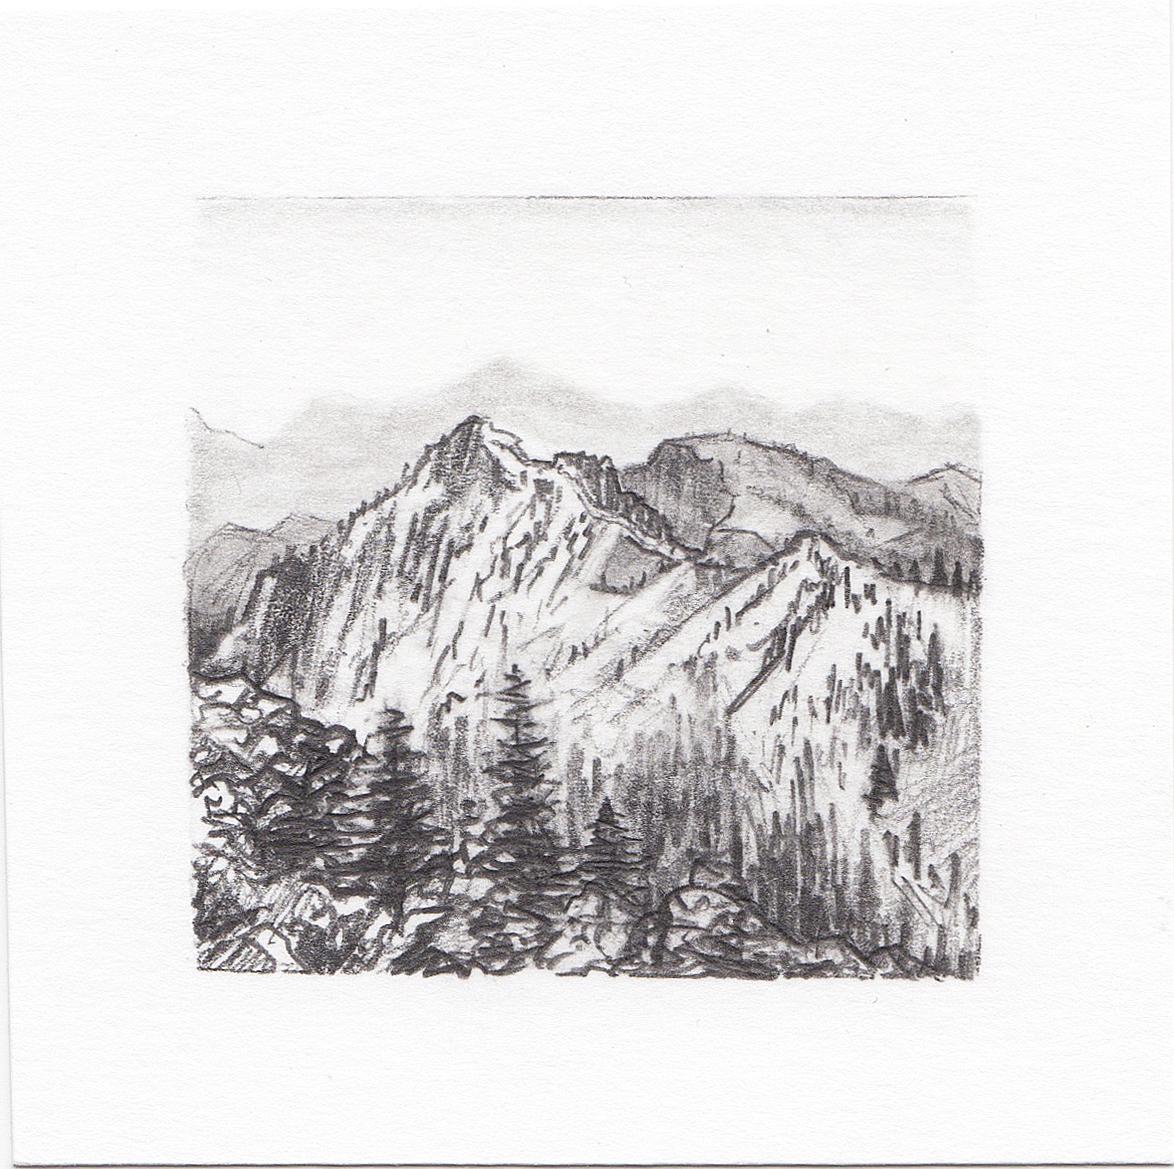 #55 Yosemite National Park, California | 3x3 | graphite